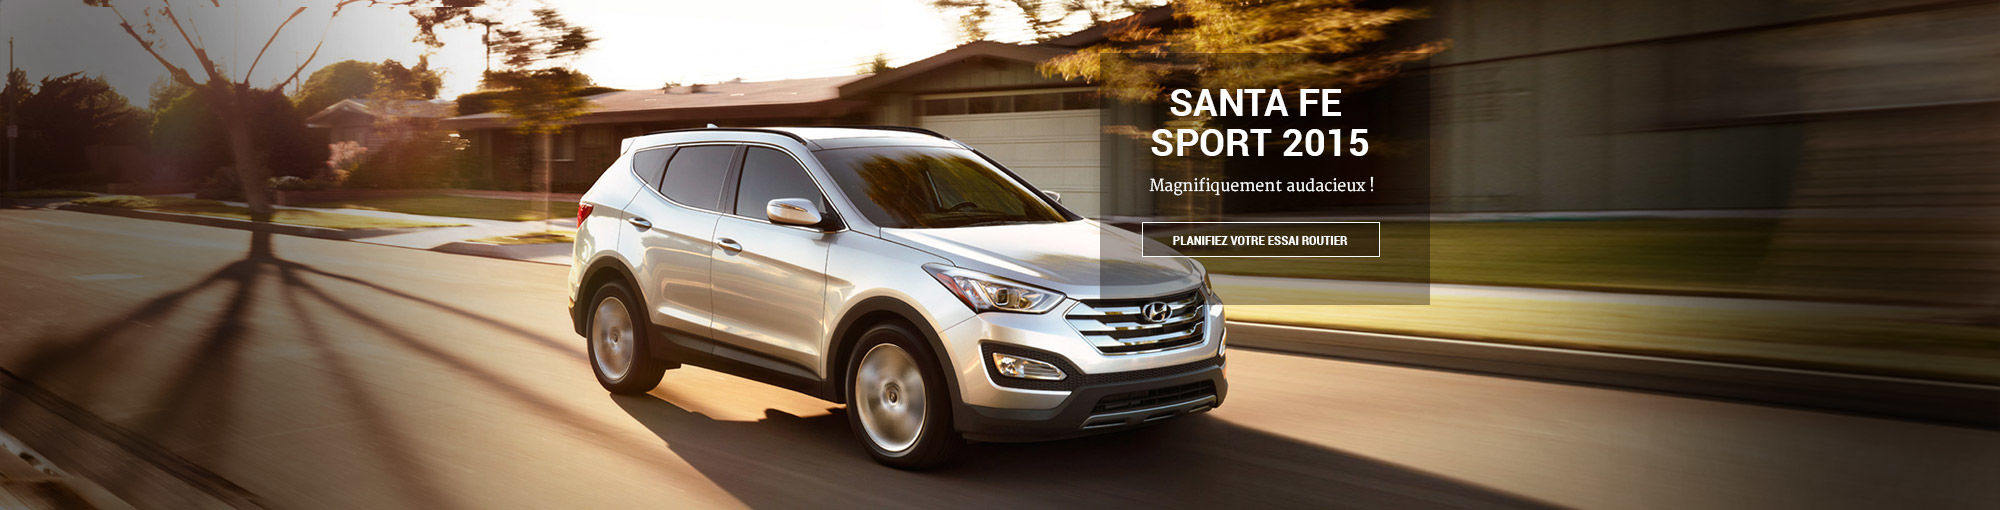 Santa Fe Sport 2015